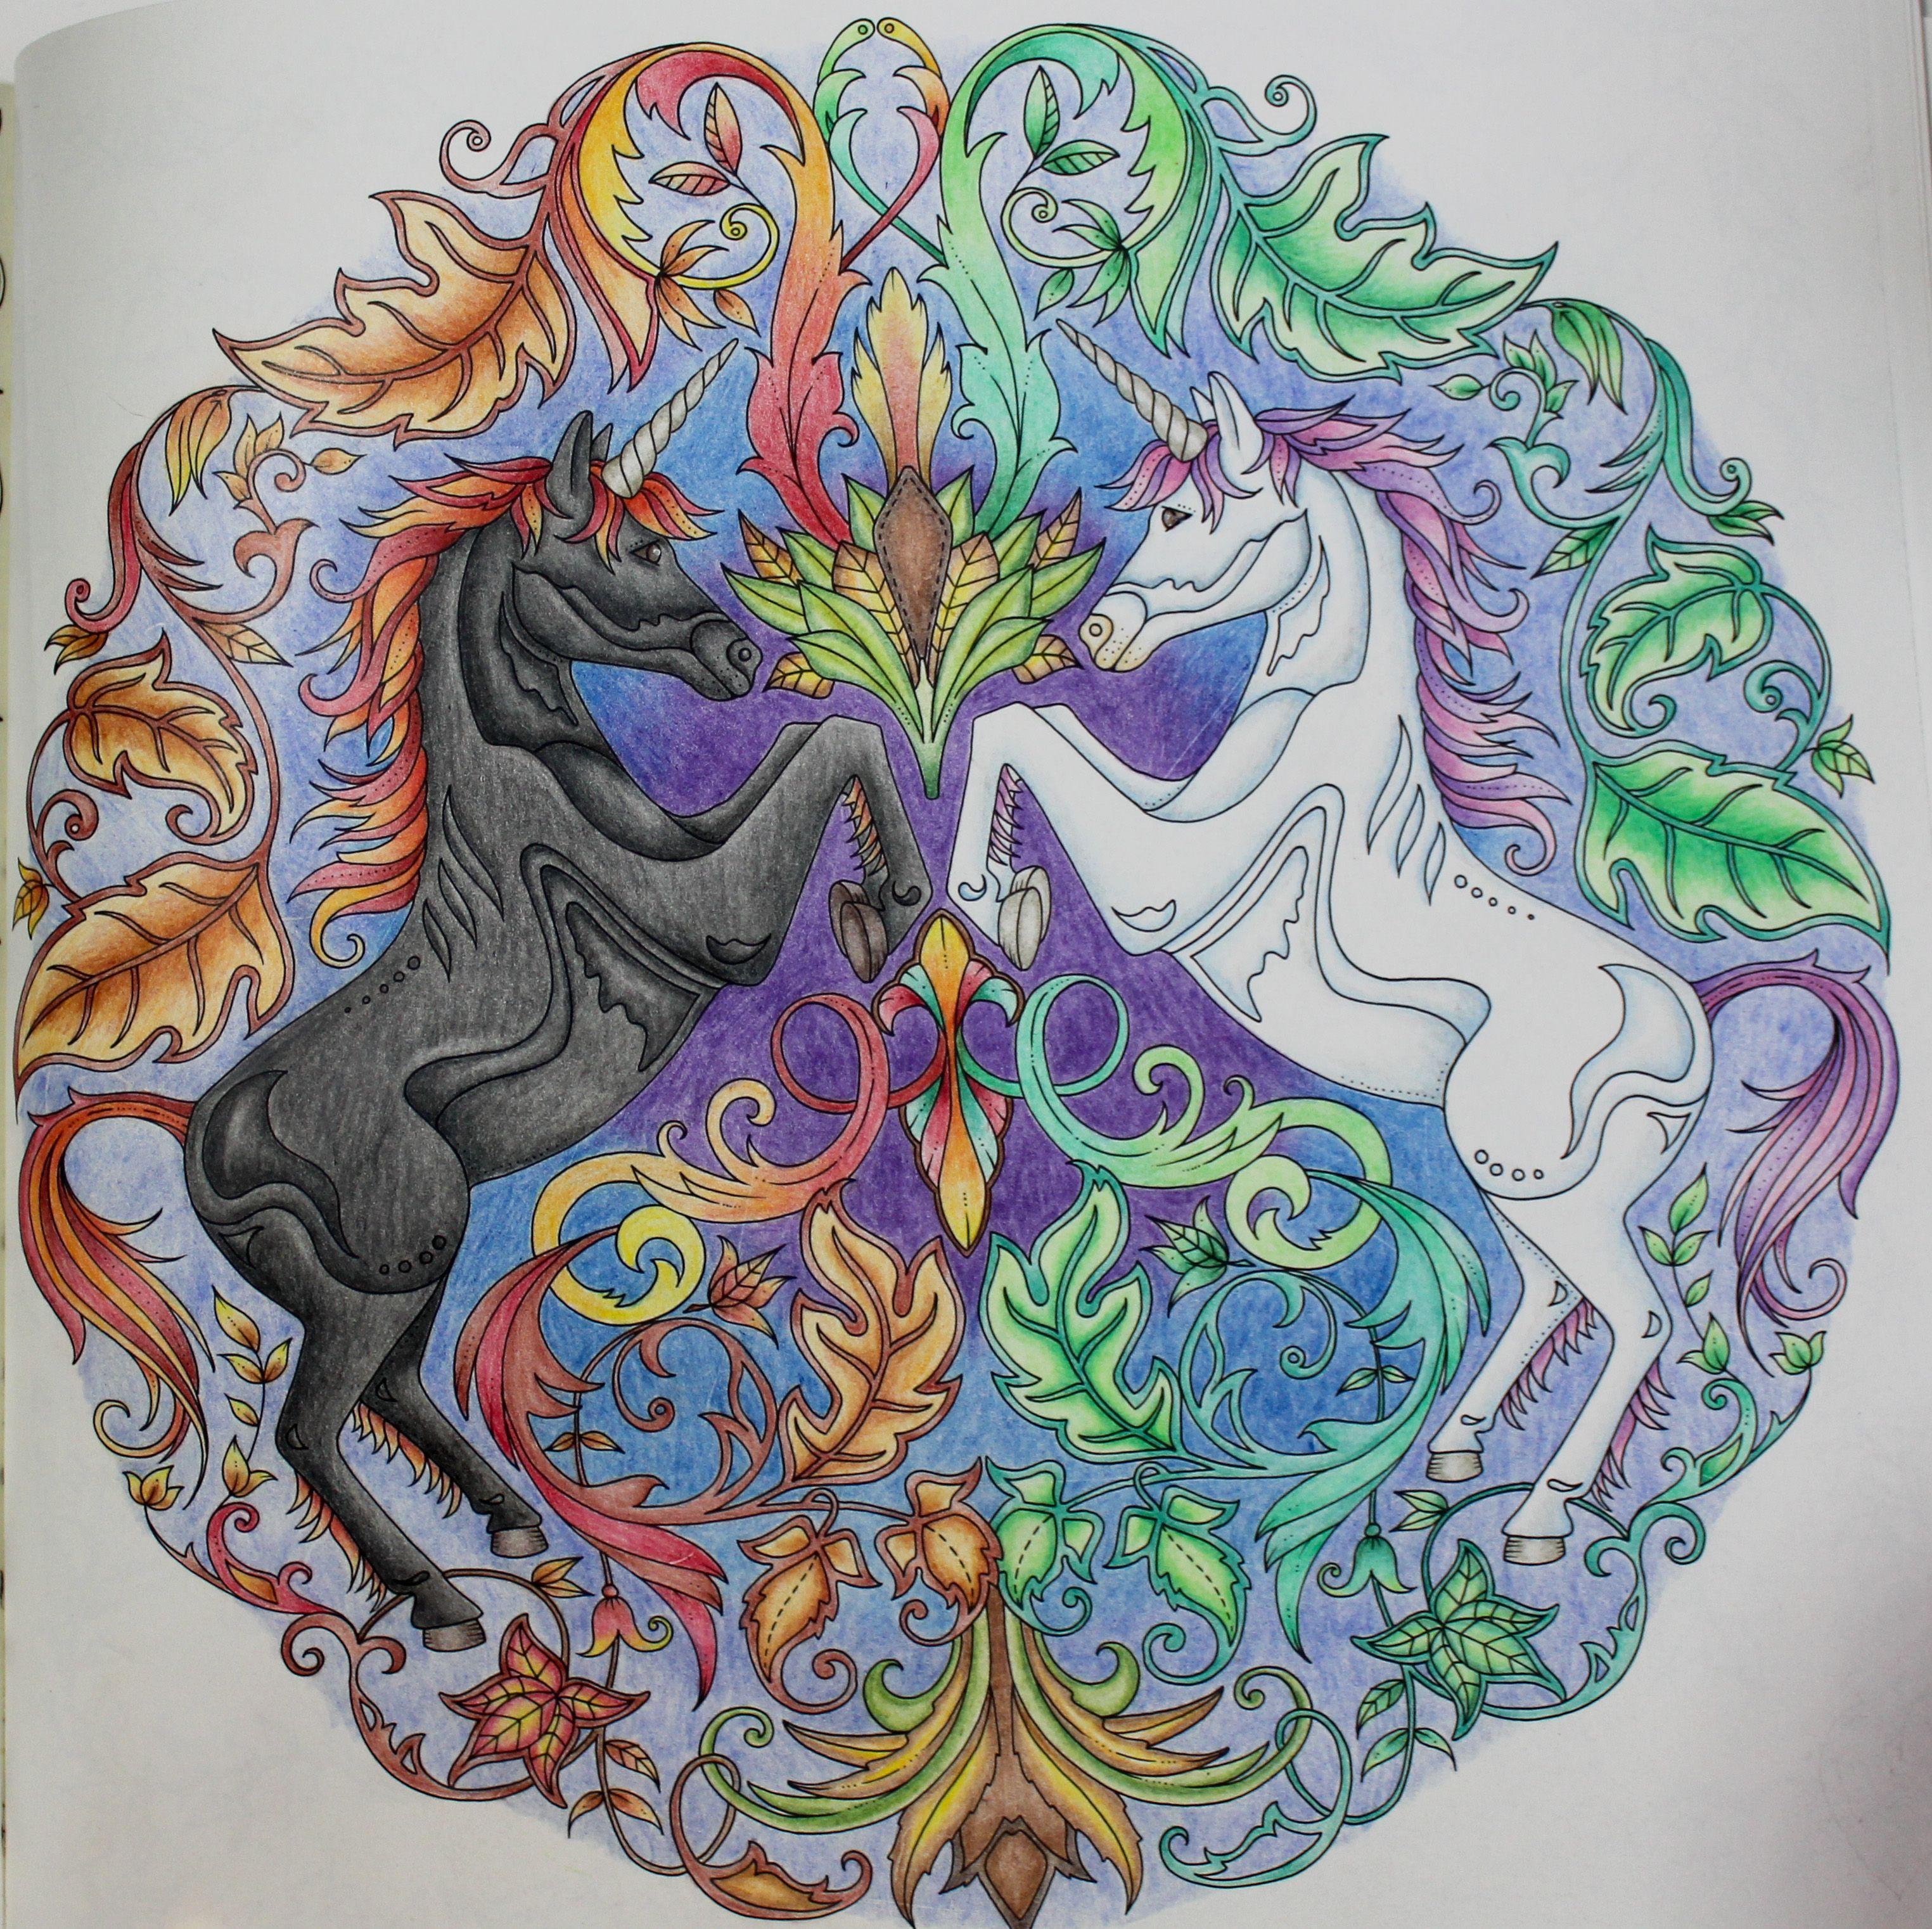 Johanna Basford Enchanted Forest Unicorns Enchanted Forest Coloring Book Johanna Basford Enchanted Forest Coloring Book Enchanted Forest Coloring